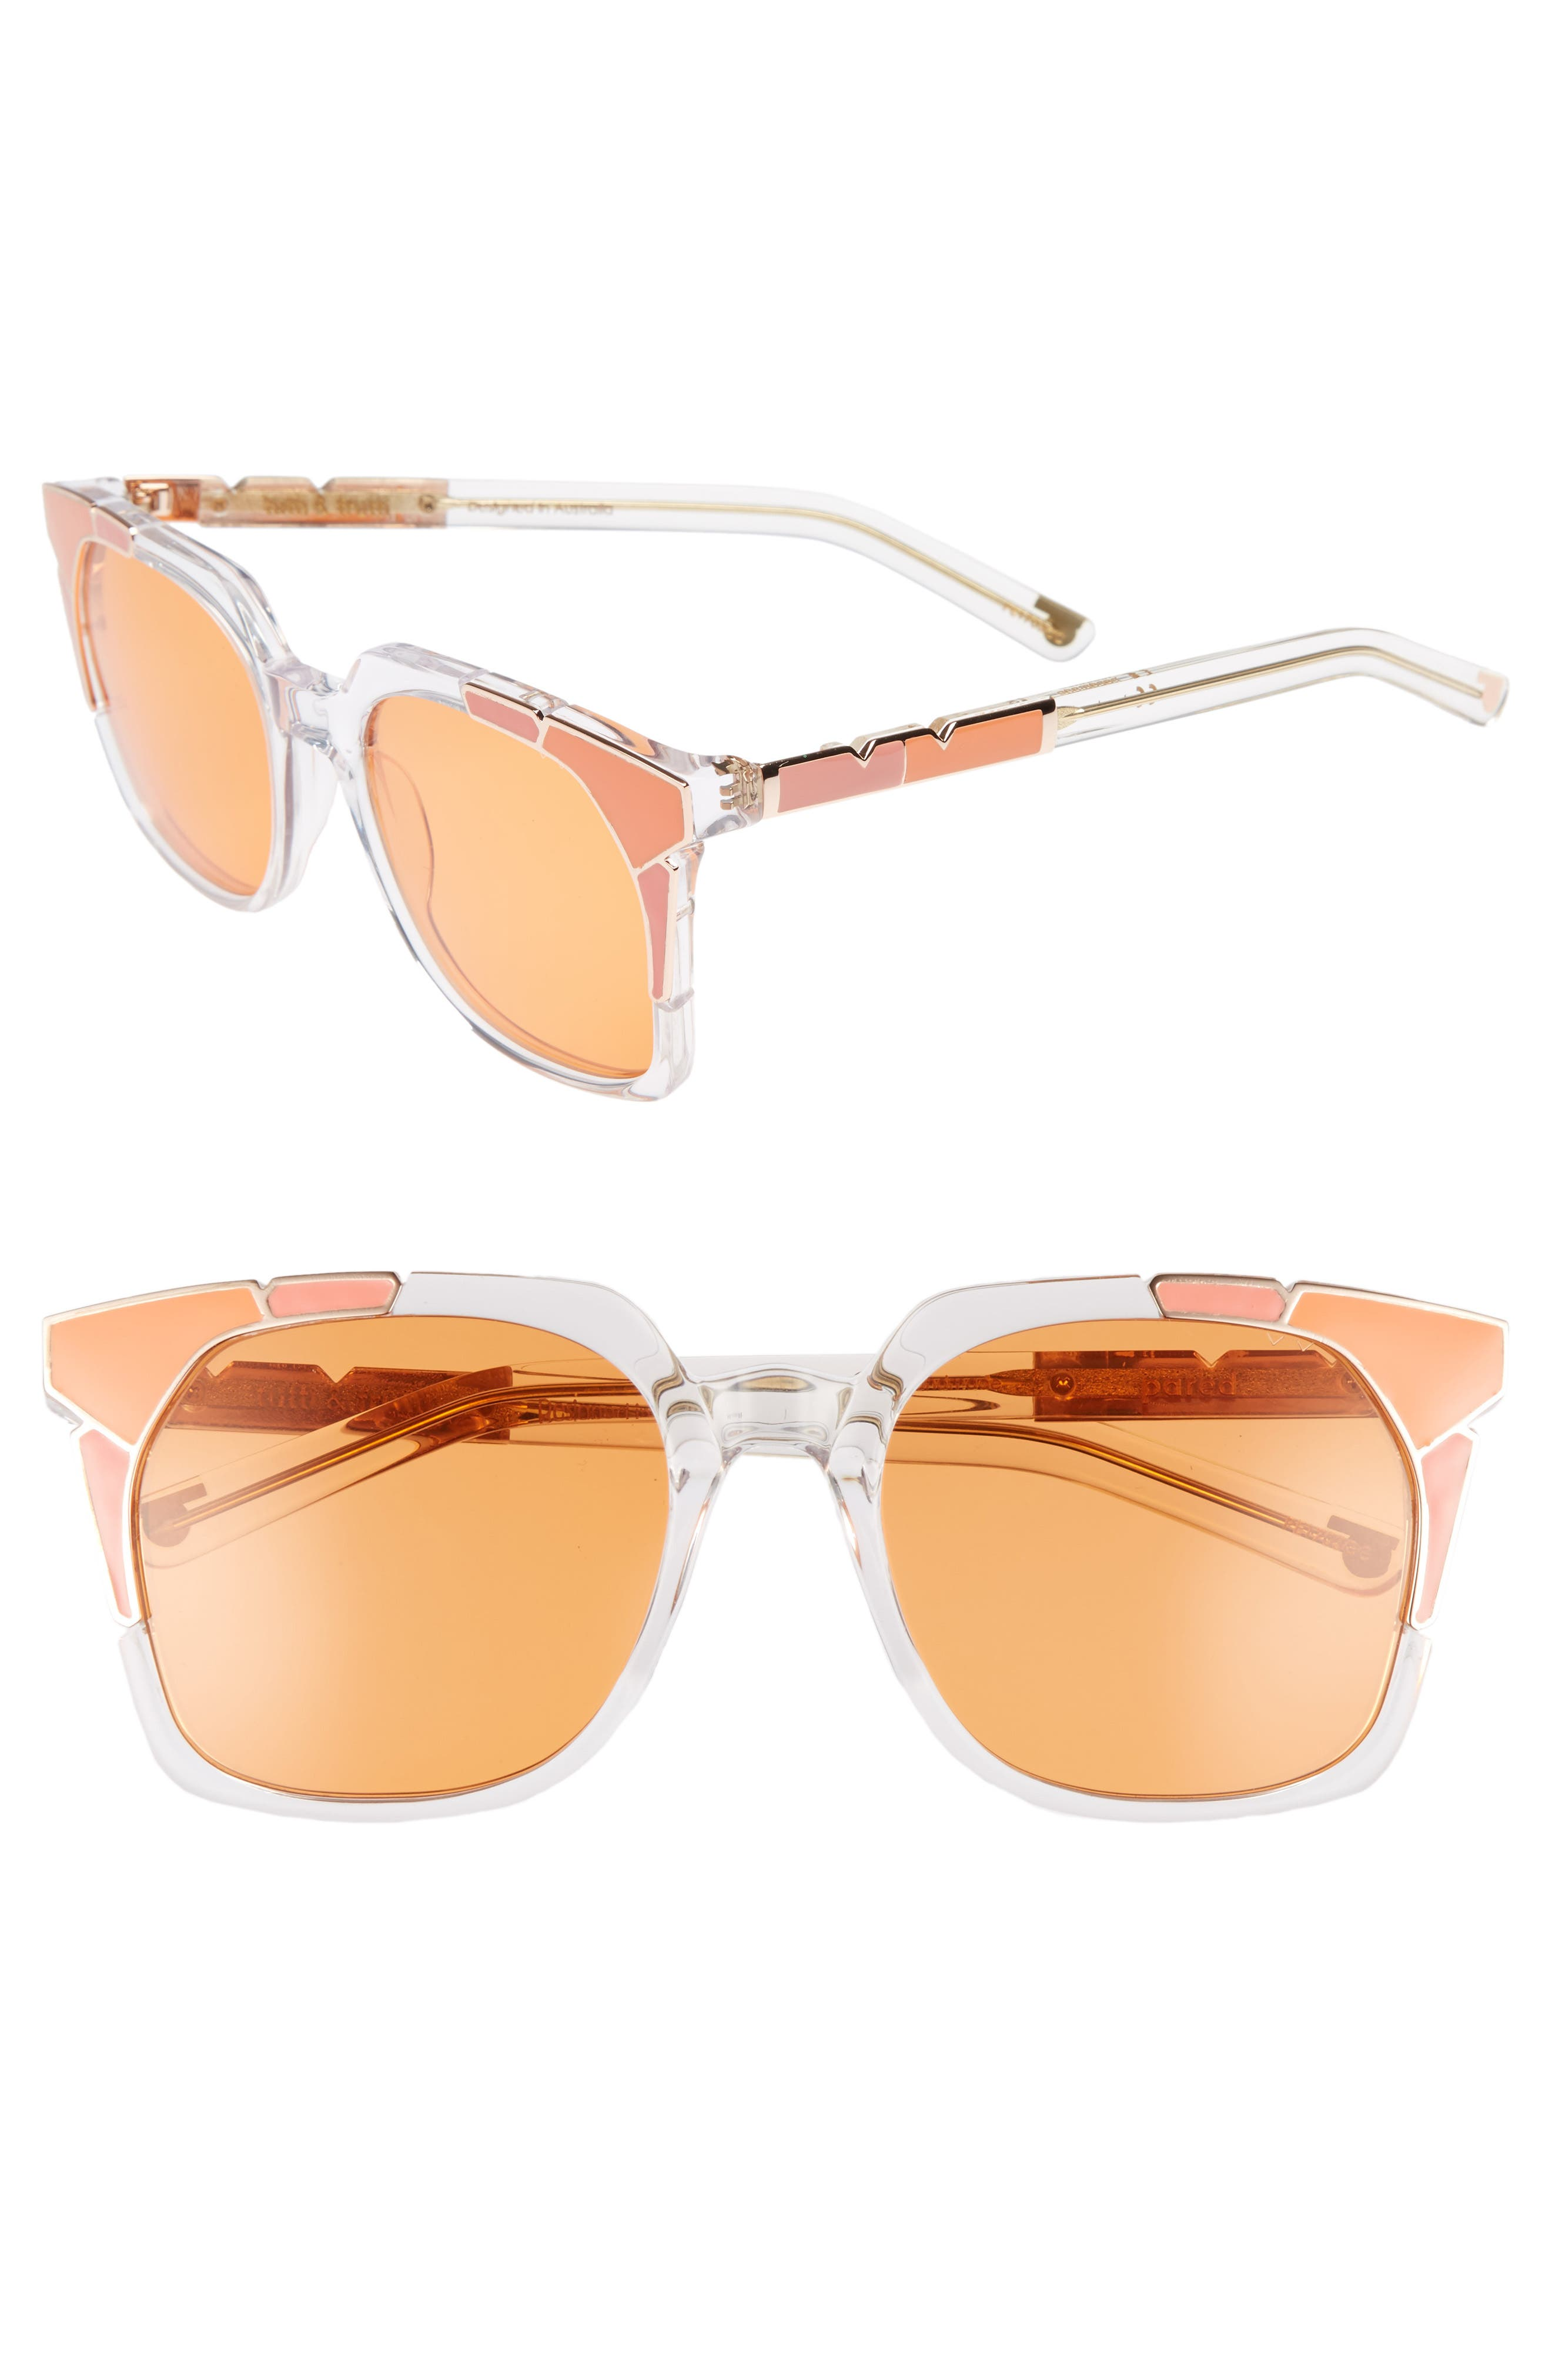 Tutti & Frutti 55mm Sunglasses,                             Main thumbnail 1, color,                             SALMON ORANGE/ ROSE GOLD